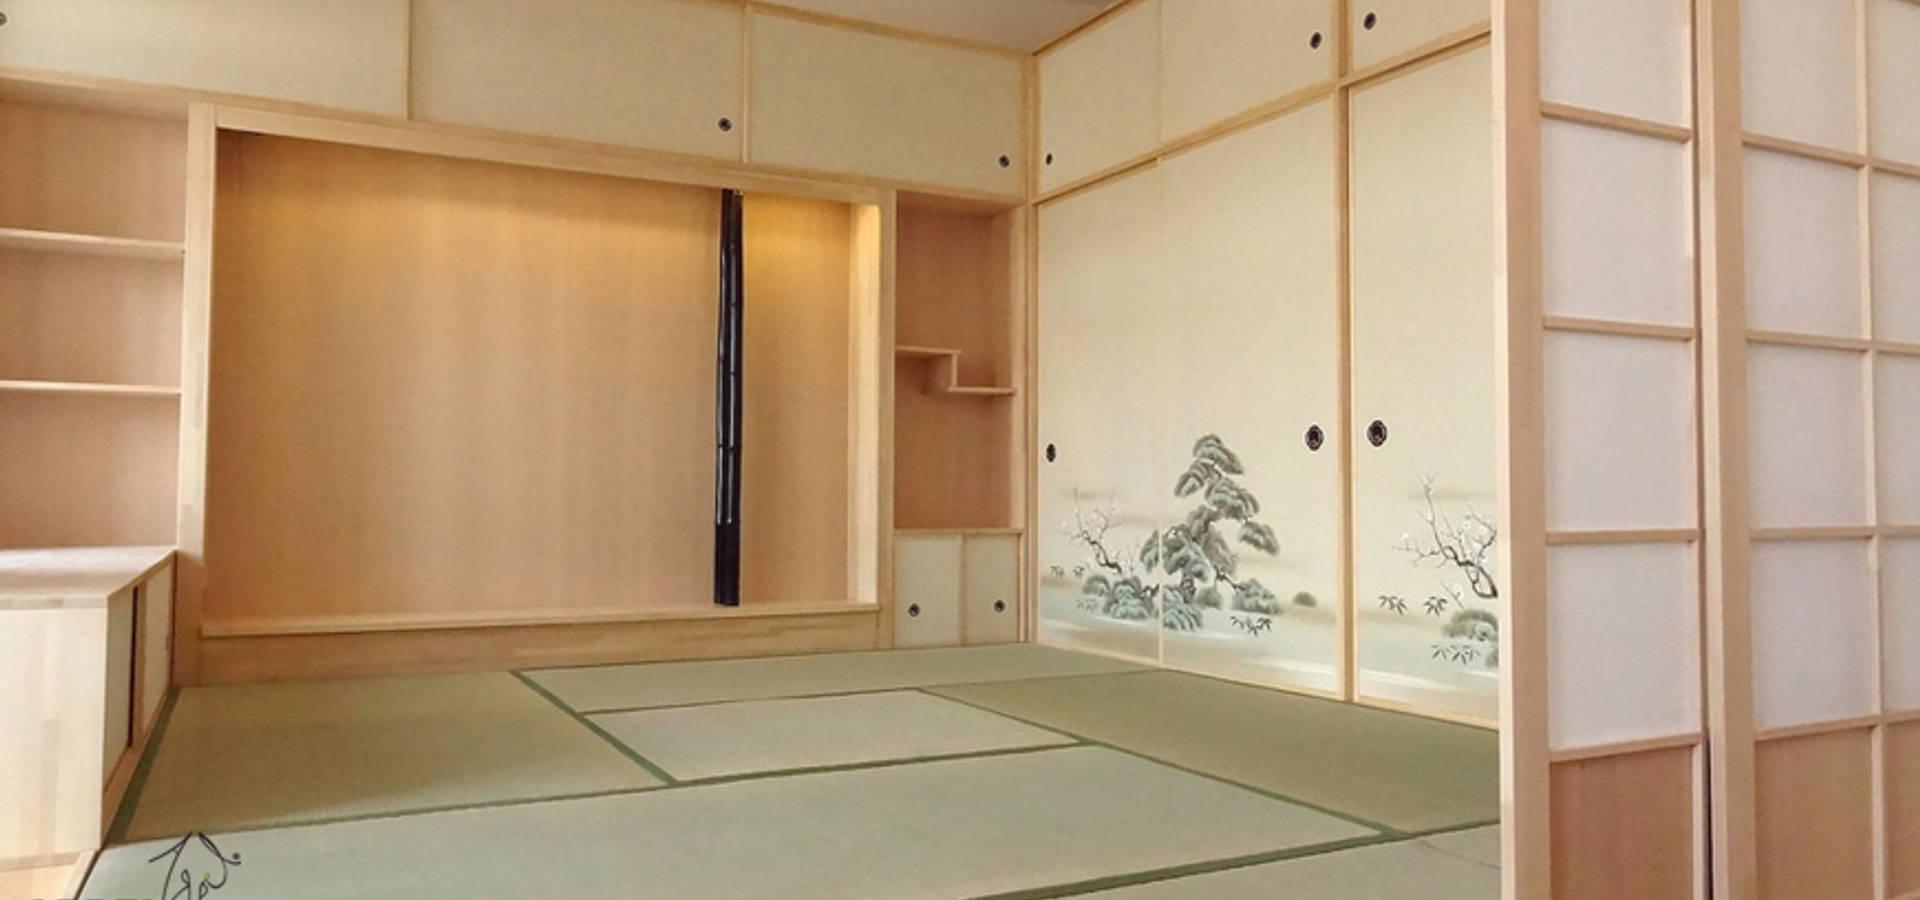 Camera da letto in stile giapponese Shoji by Arpel | homify